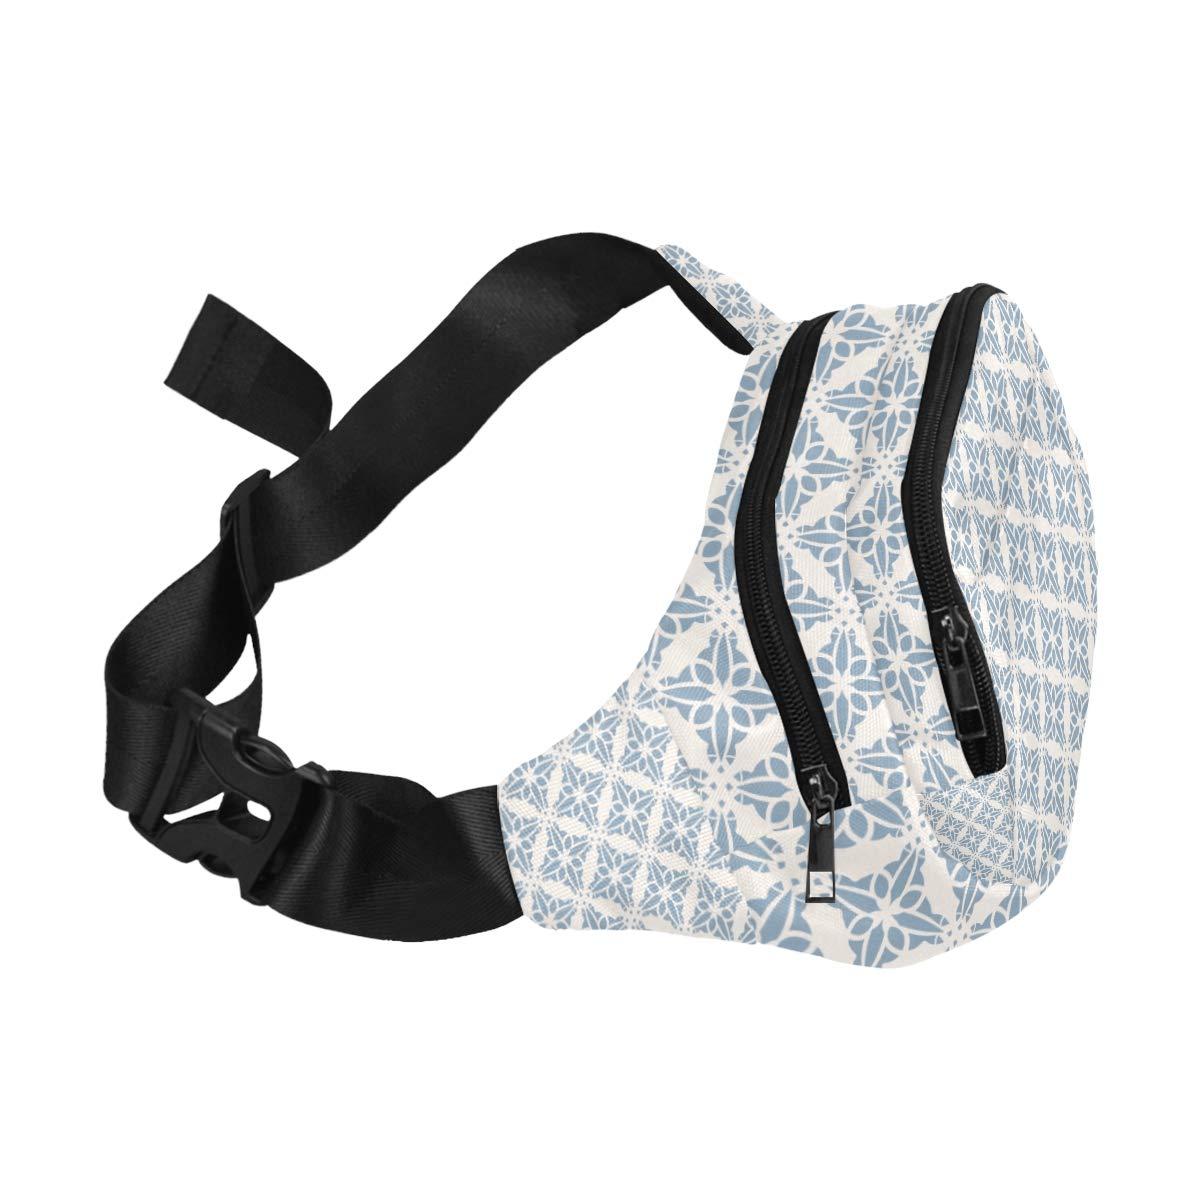 Floral Of Six Diamond Petals Fenny Packs Waist Bags Adjustable Belt Waterproof Nylon Travel Running Sport Vacation Party For Men Women Boys Girls Kids